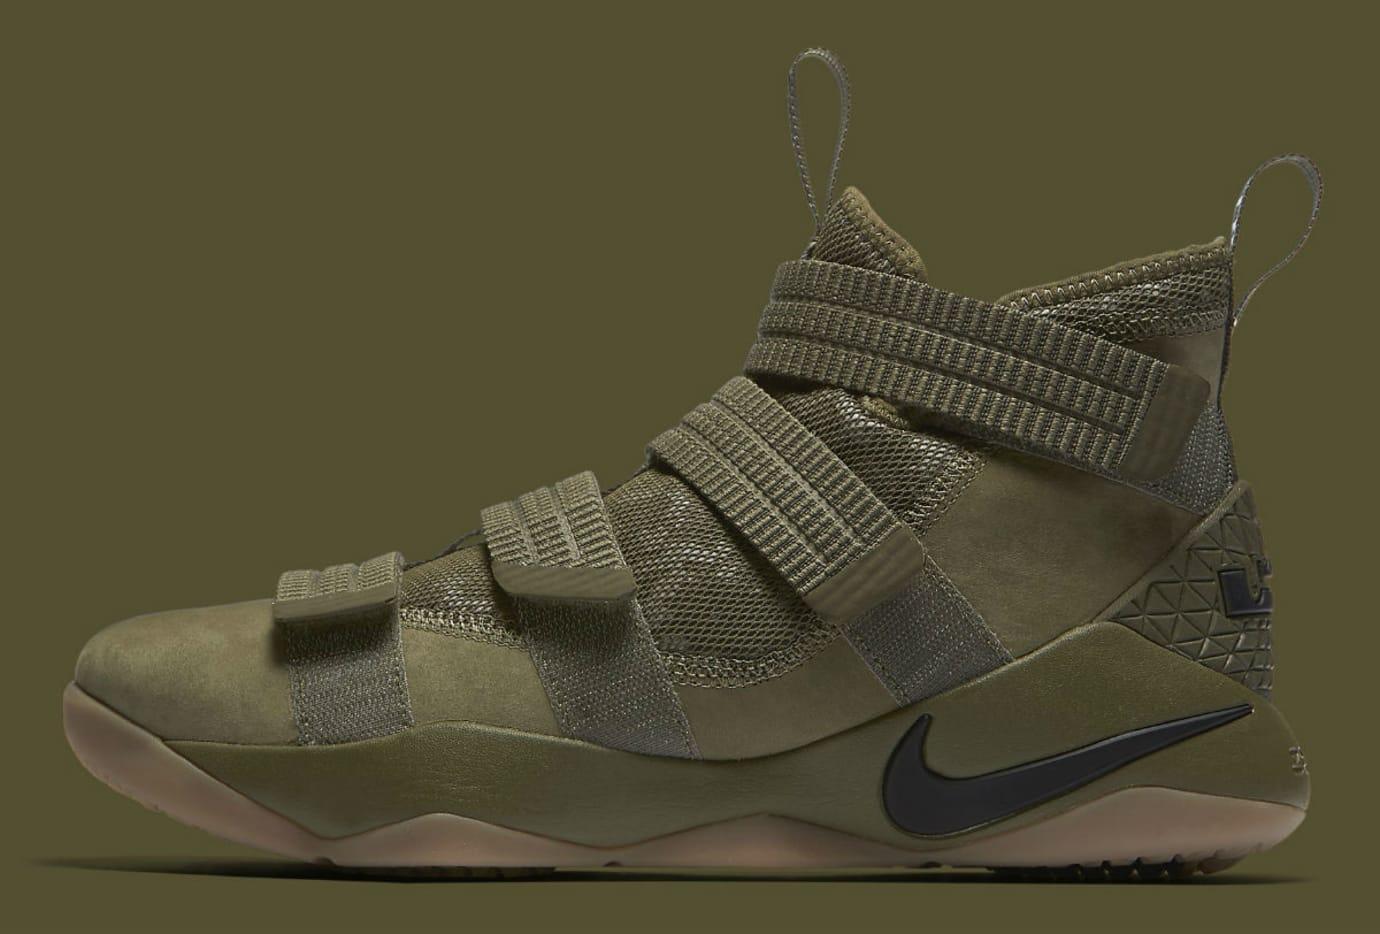 03367e683e9 Nike LeBron Soldier 11 SFG Olive Release Date Profile 897646-200